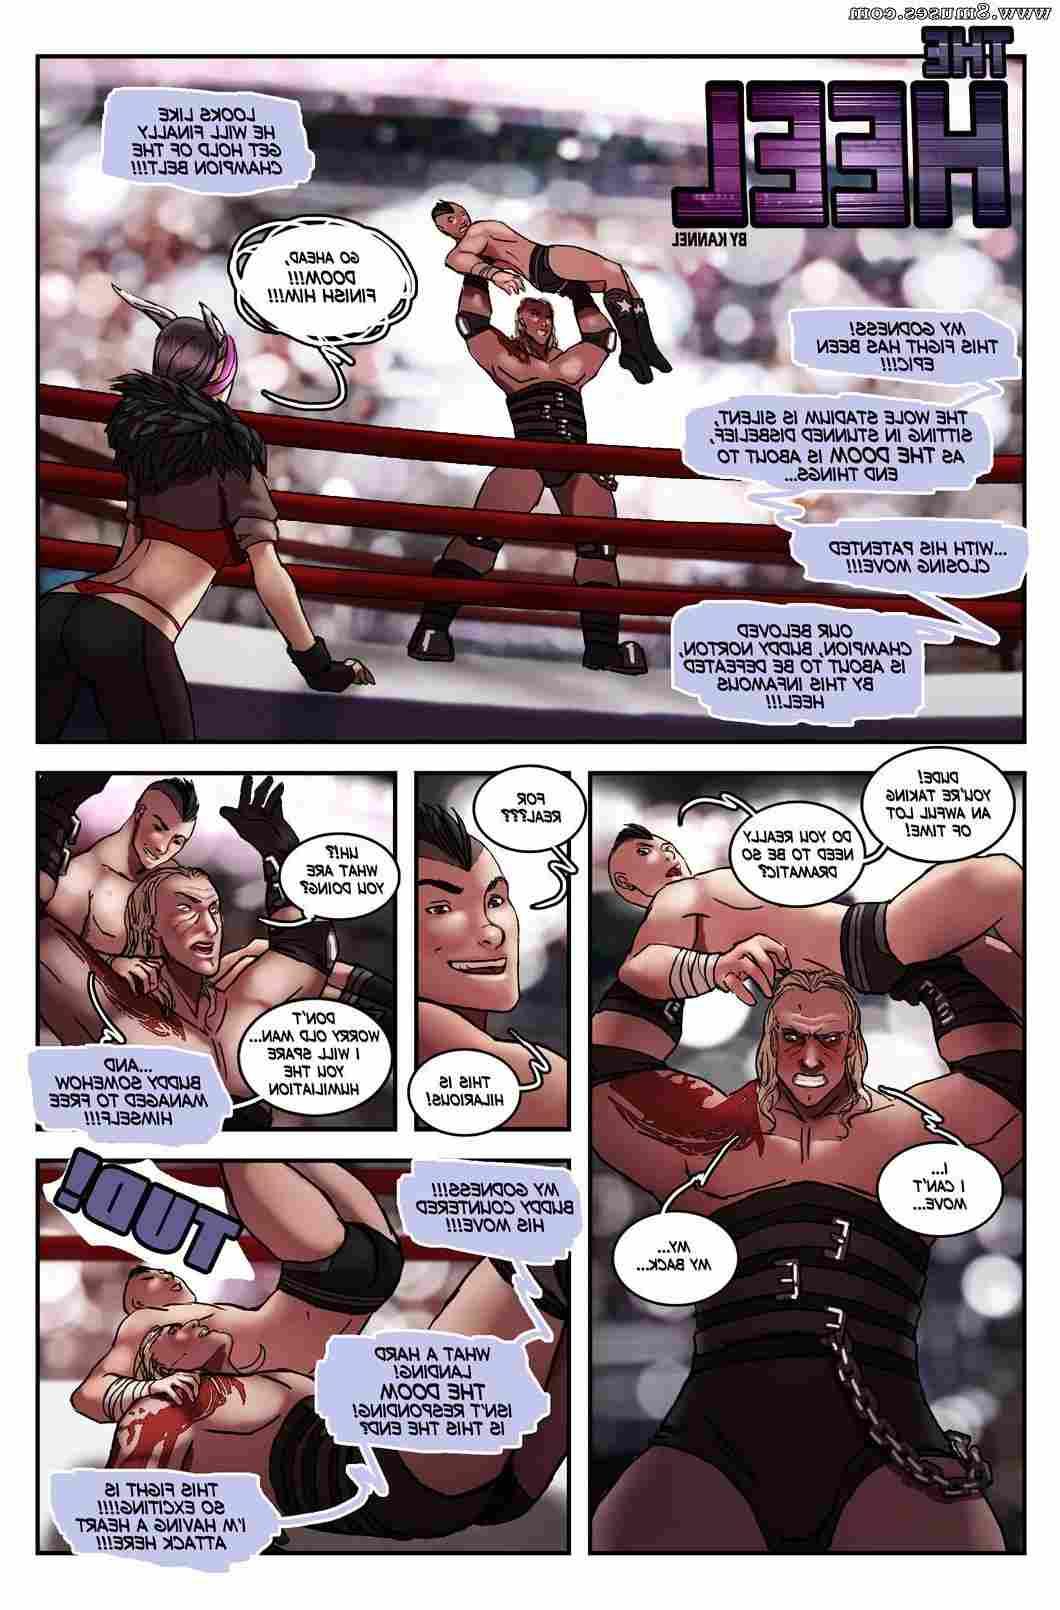 TG-Comics/Kannel/The-Heel The_Heel__8muses_-_Sex_and_Porn_Comics.jpg